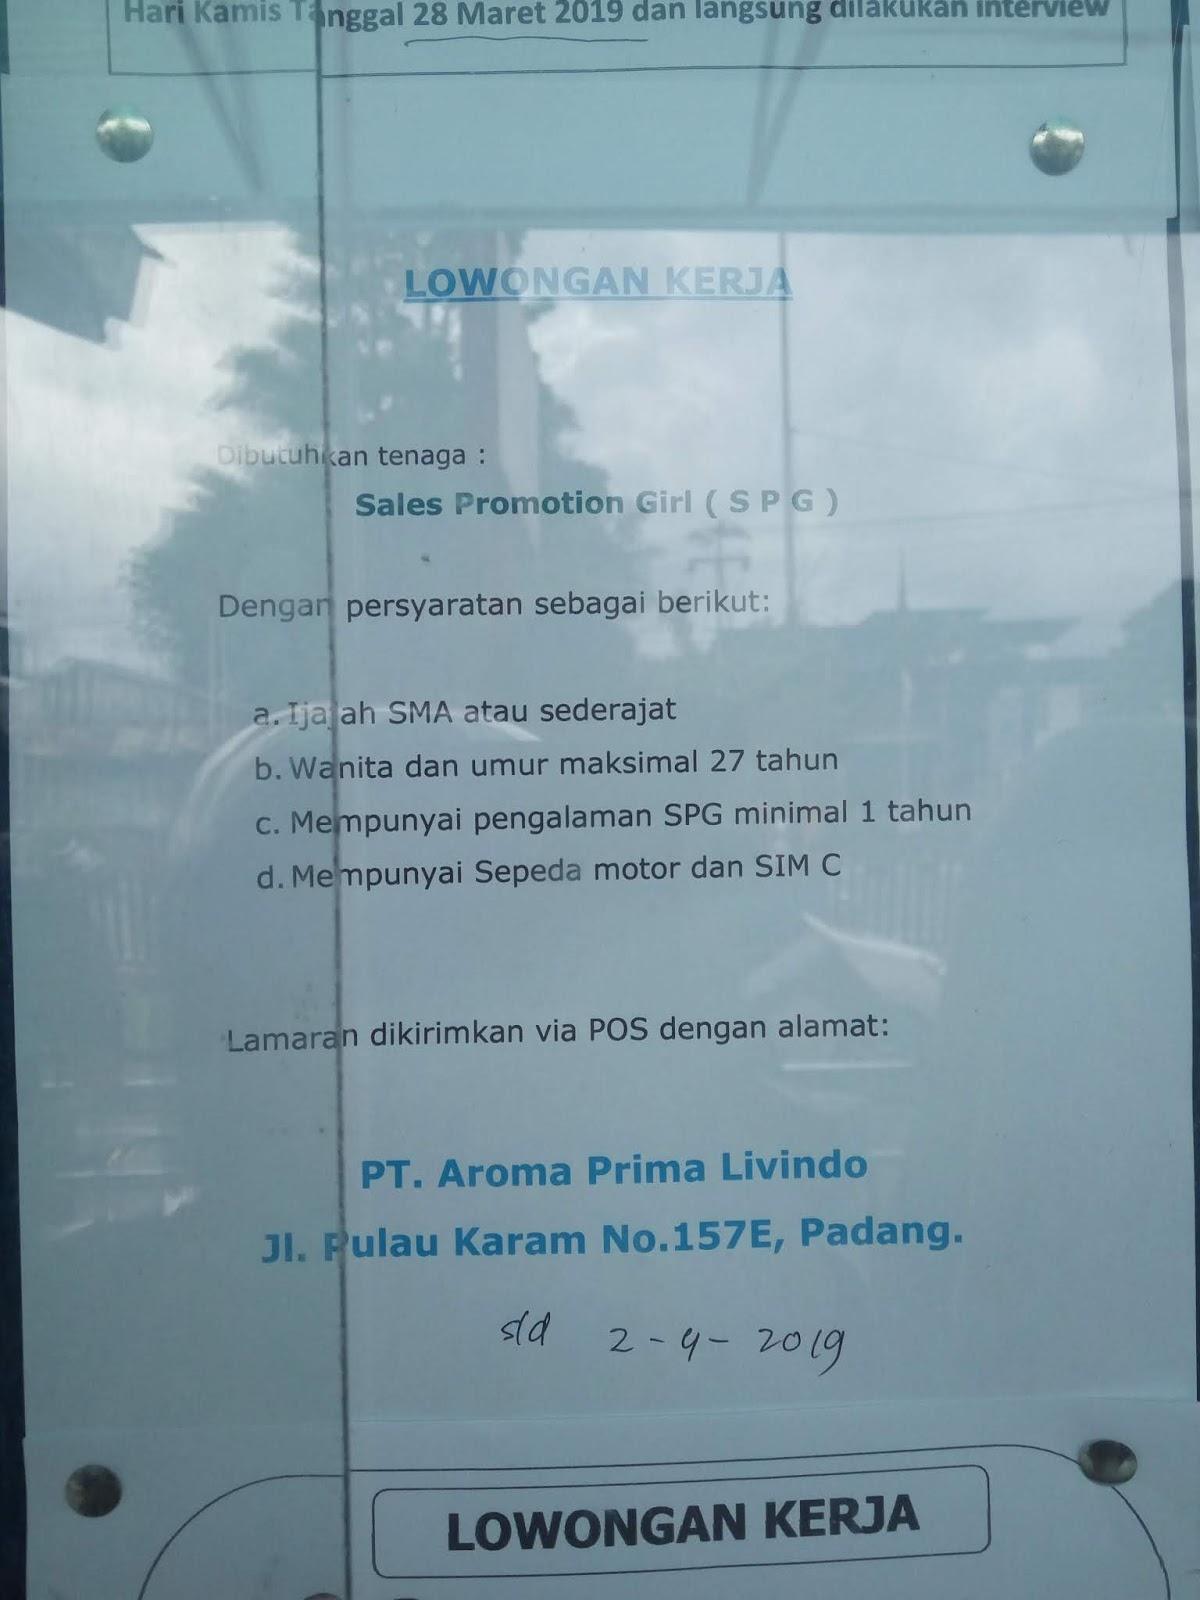 Lowongan Kerja Padang Sales Promotion Girl Spg Adsanjaya